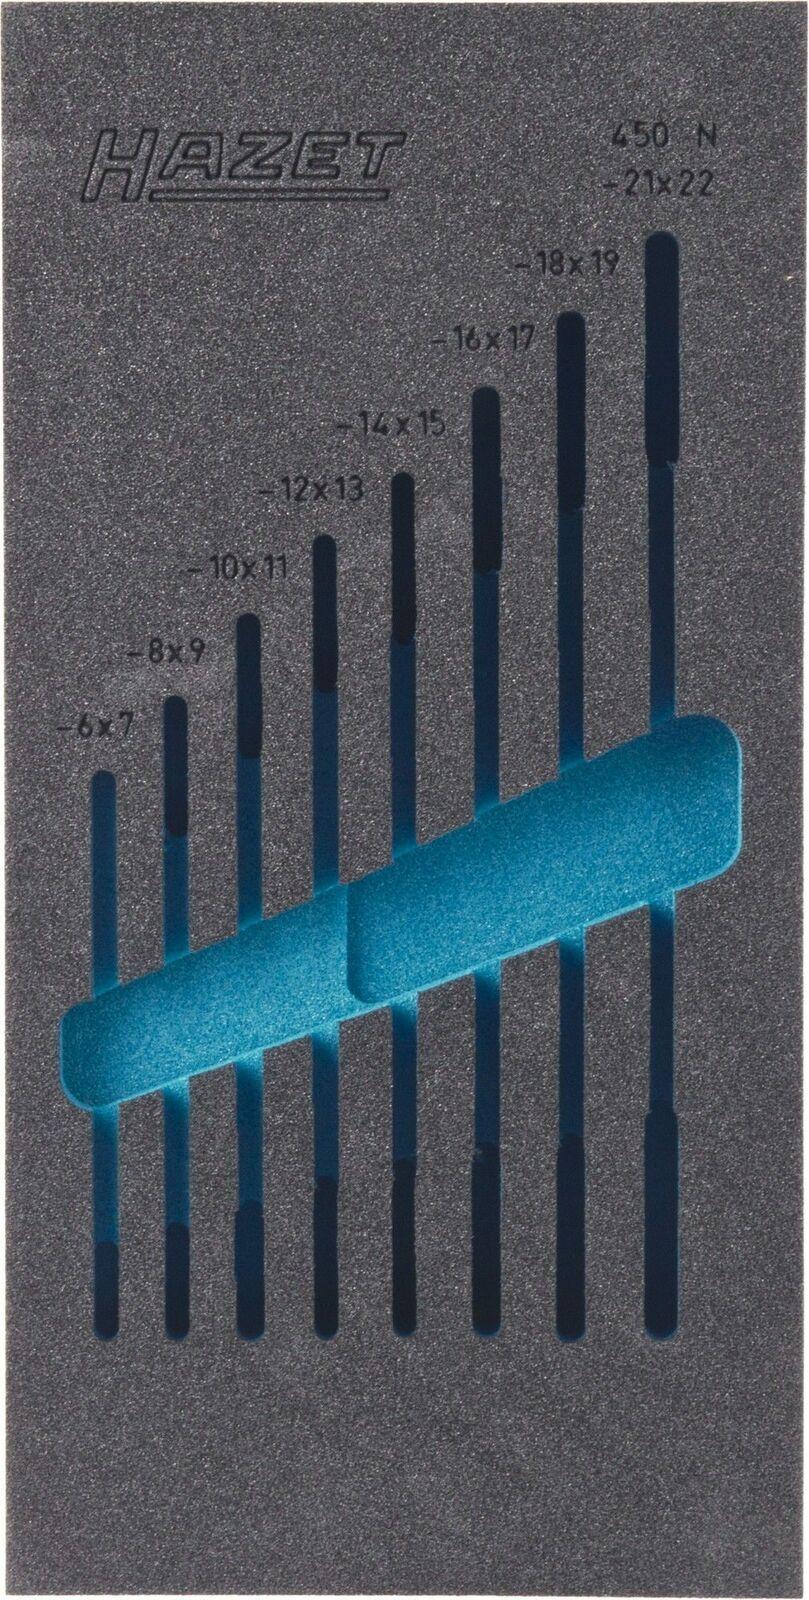 HAZET 2-component soft foam insert 163-95L